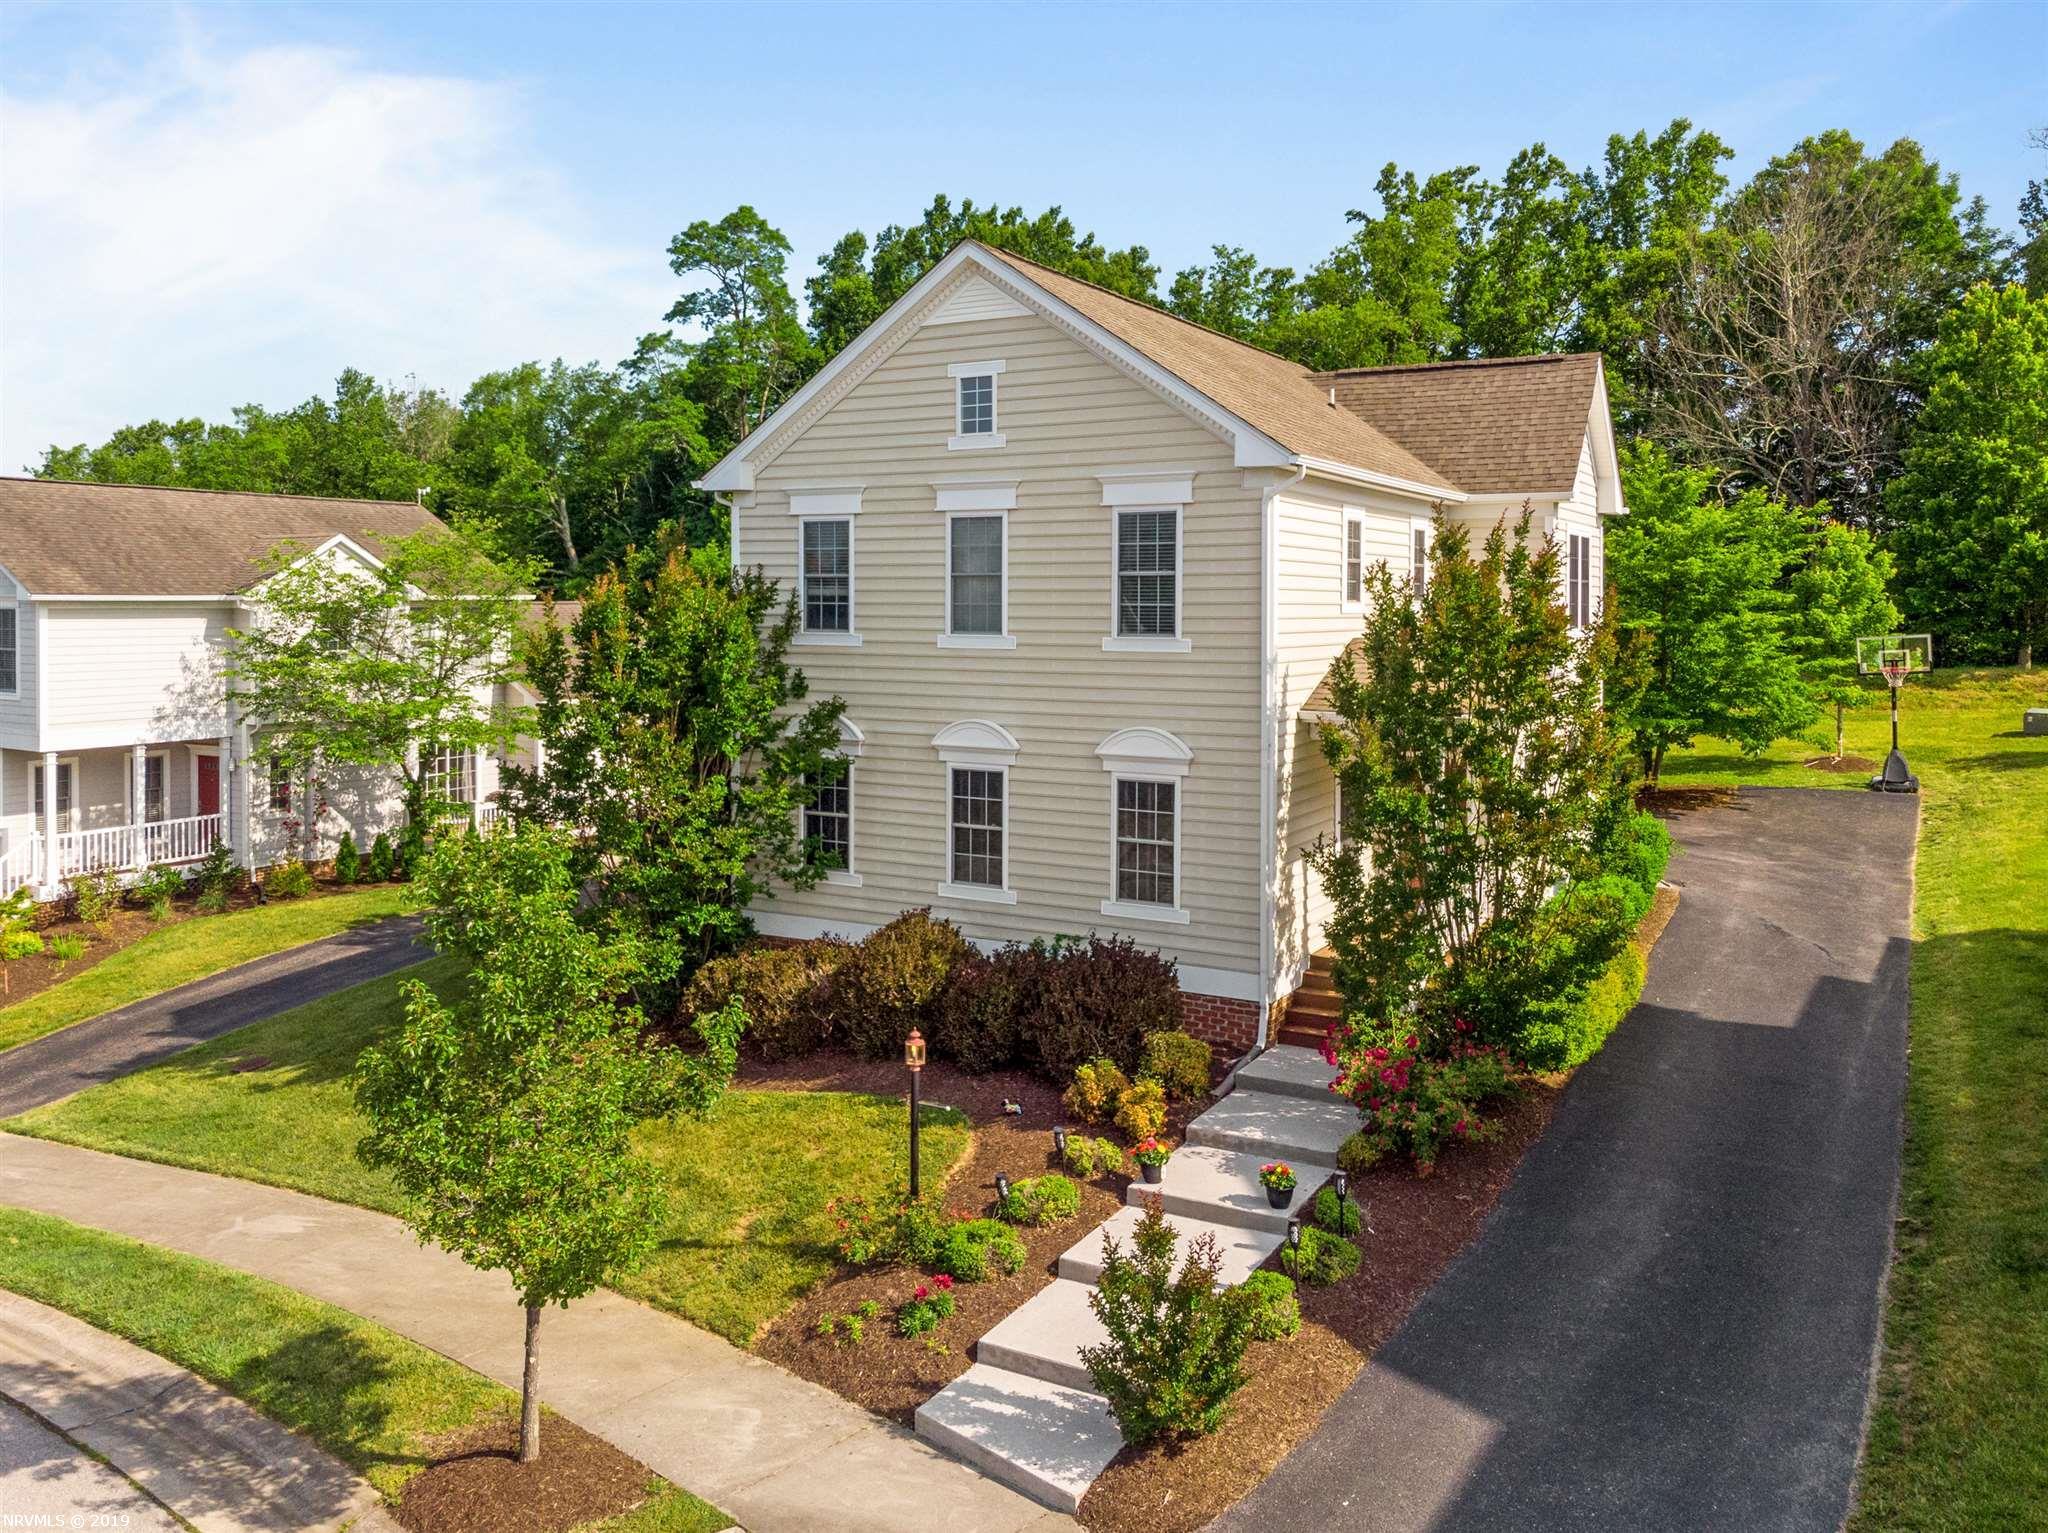 Single Family for Sale at 1123 Brook Circle Blacksburg, Virginia 24060 United States